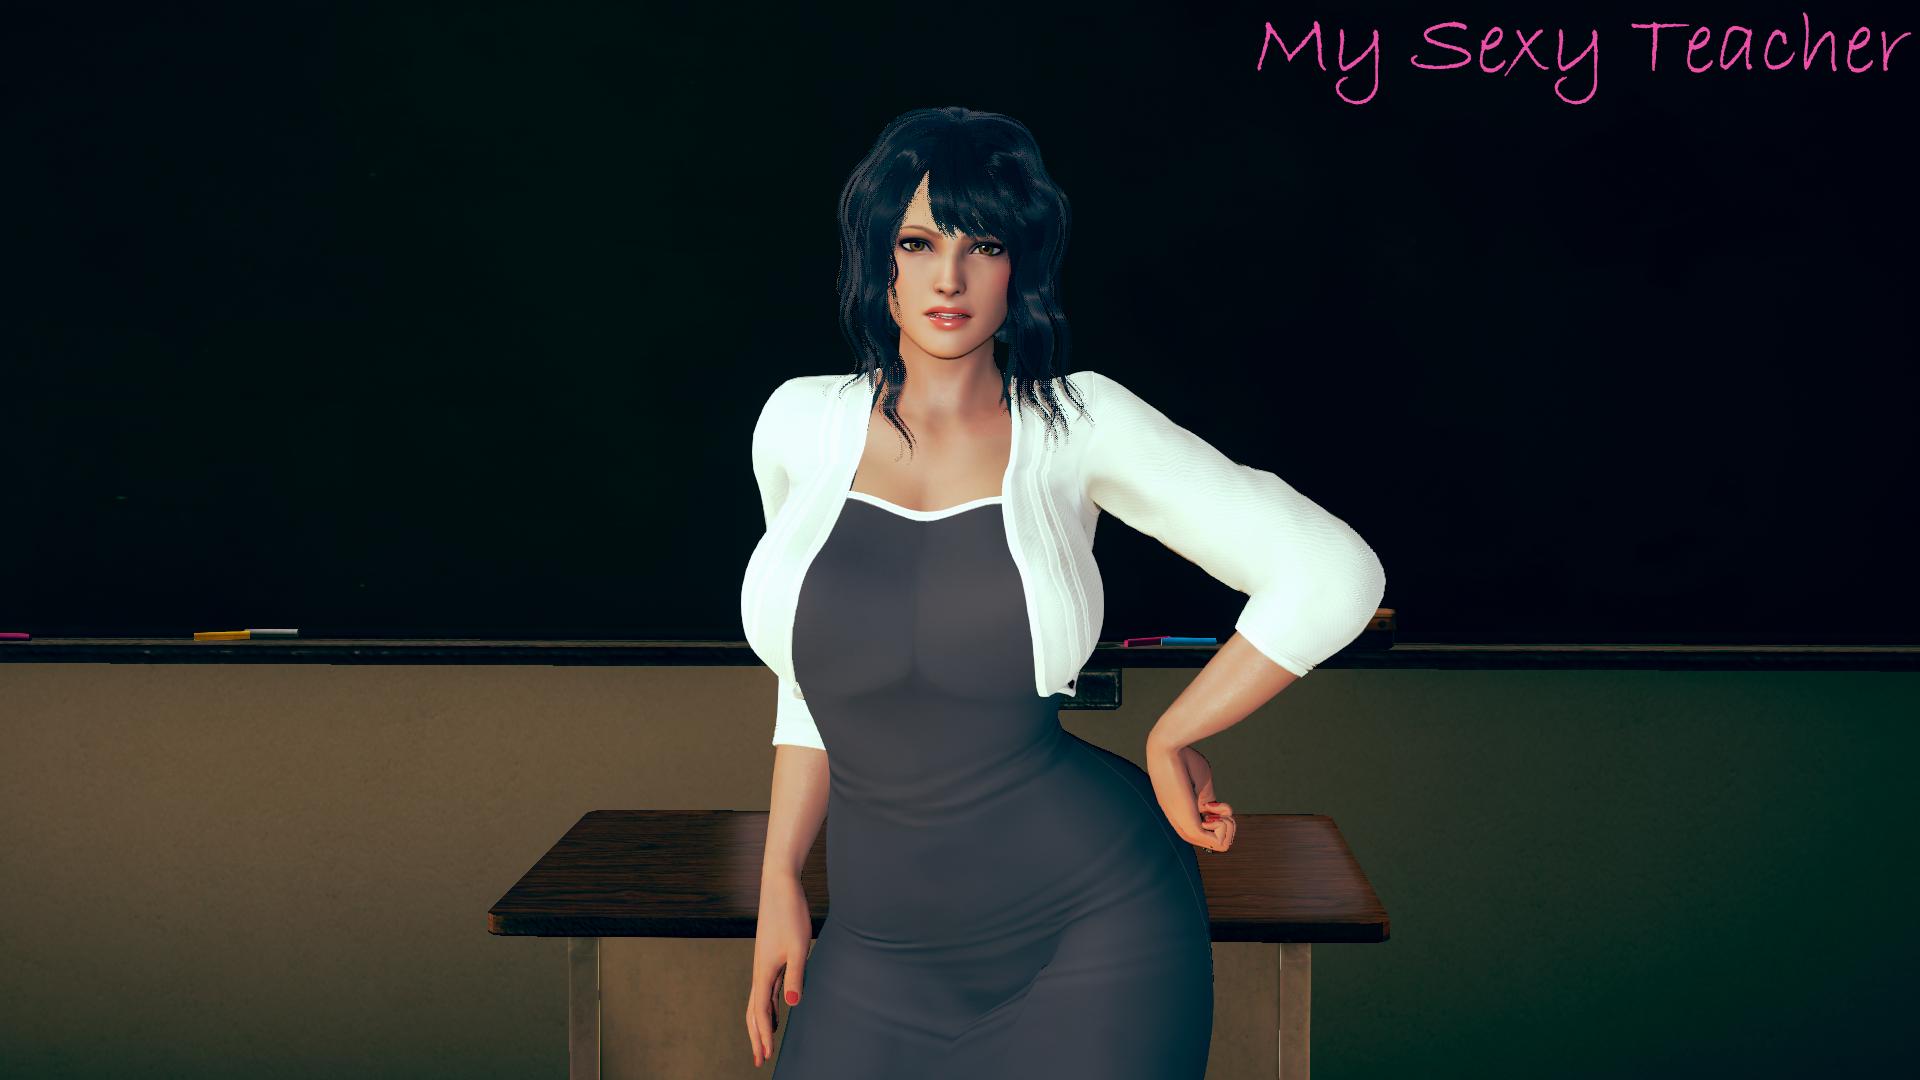 My Sexy Teacher v0.03 - free game download, reviews, mega